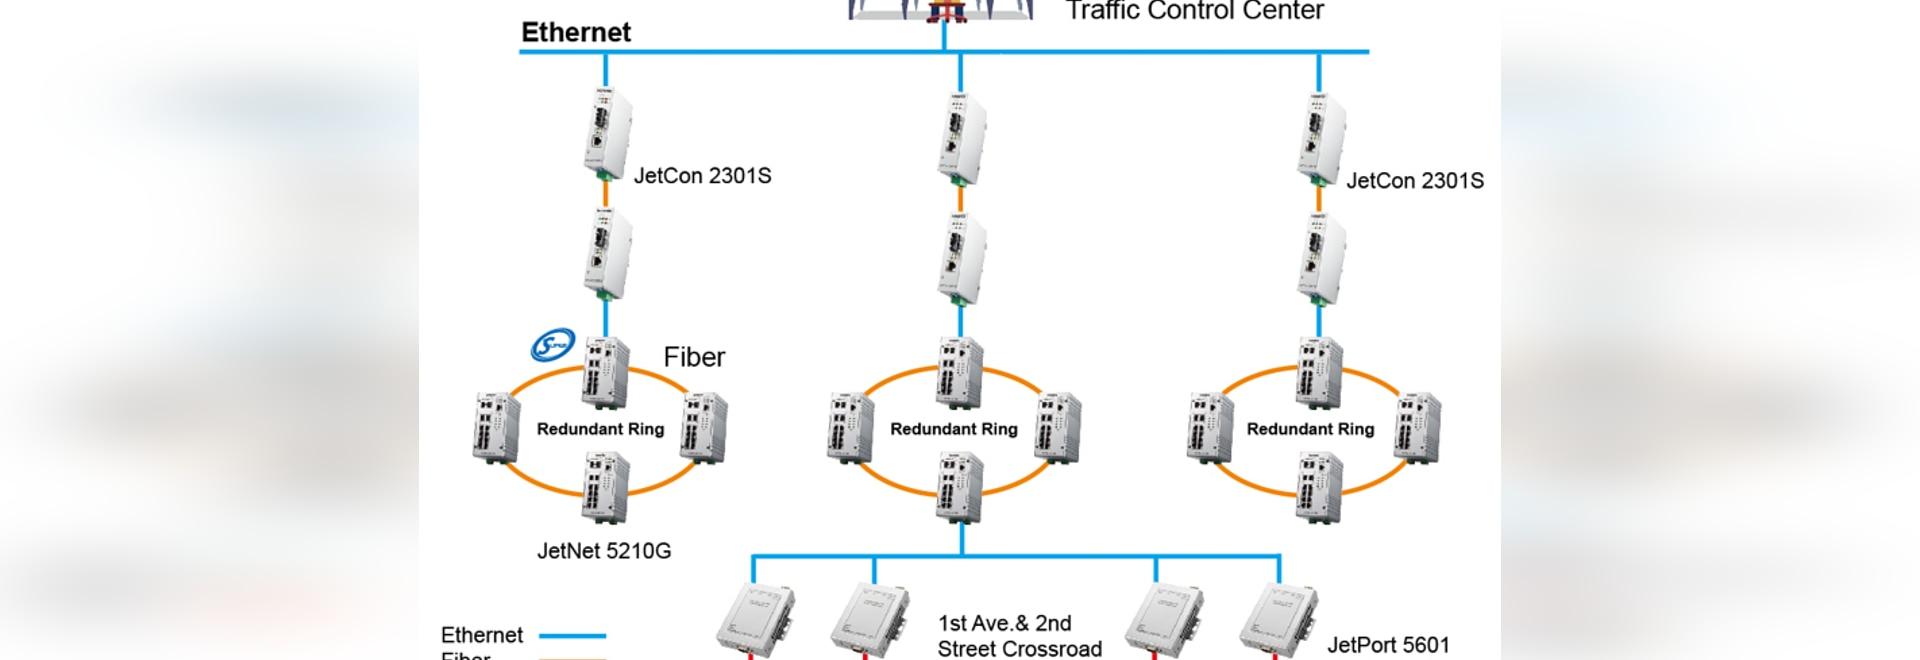 Traffic Control Center